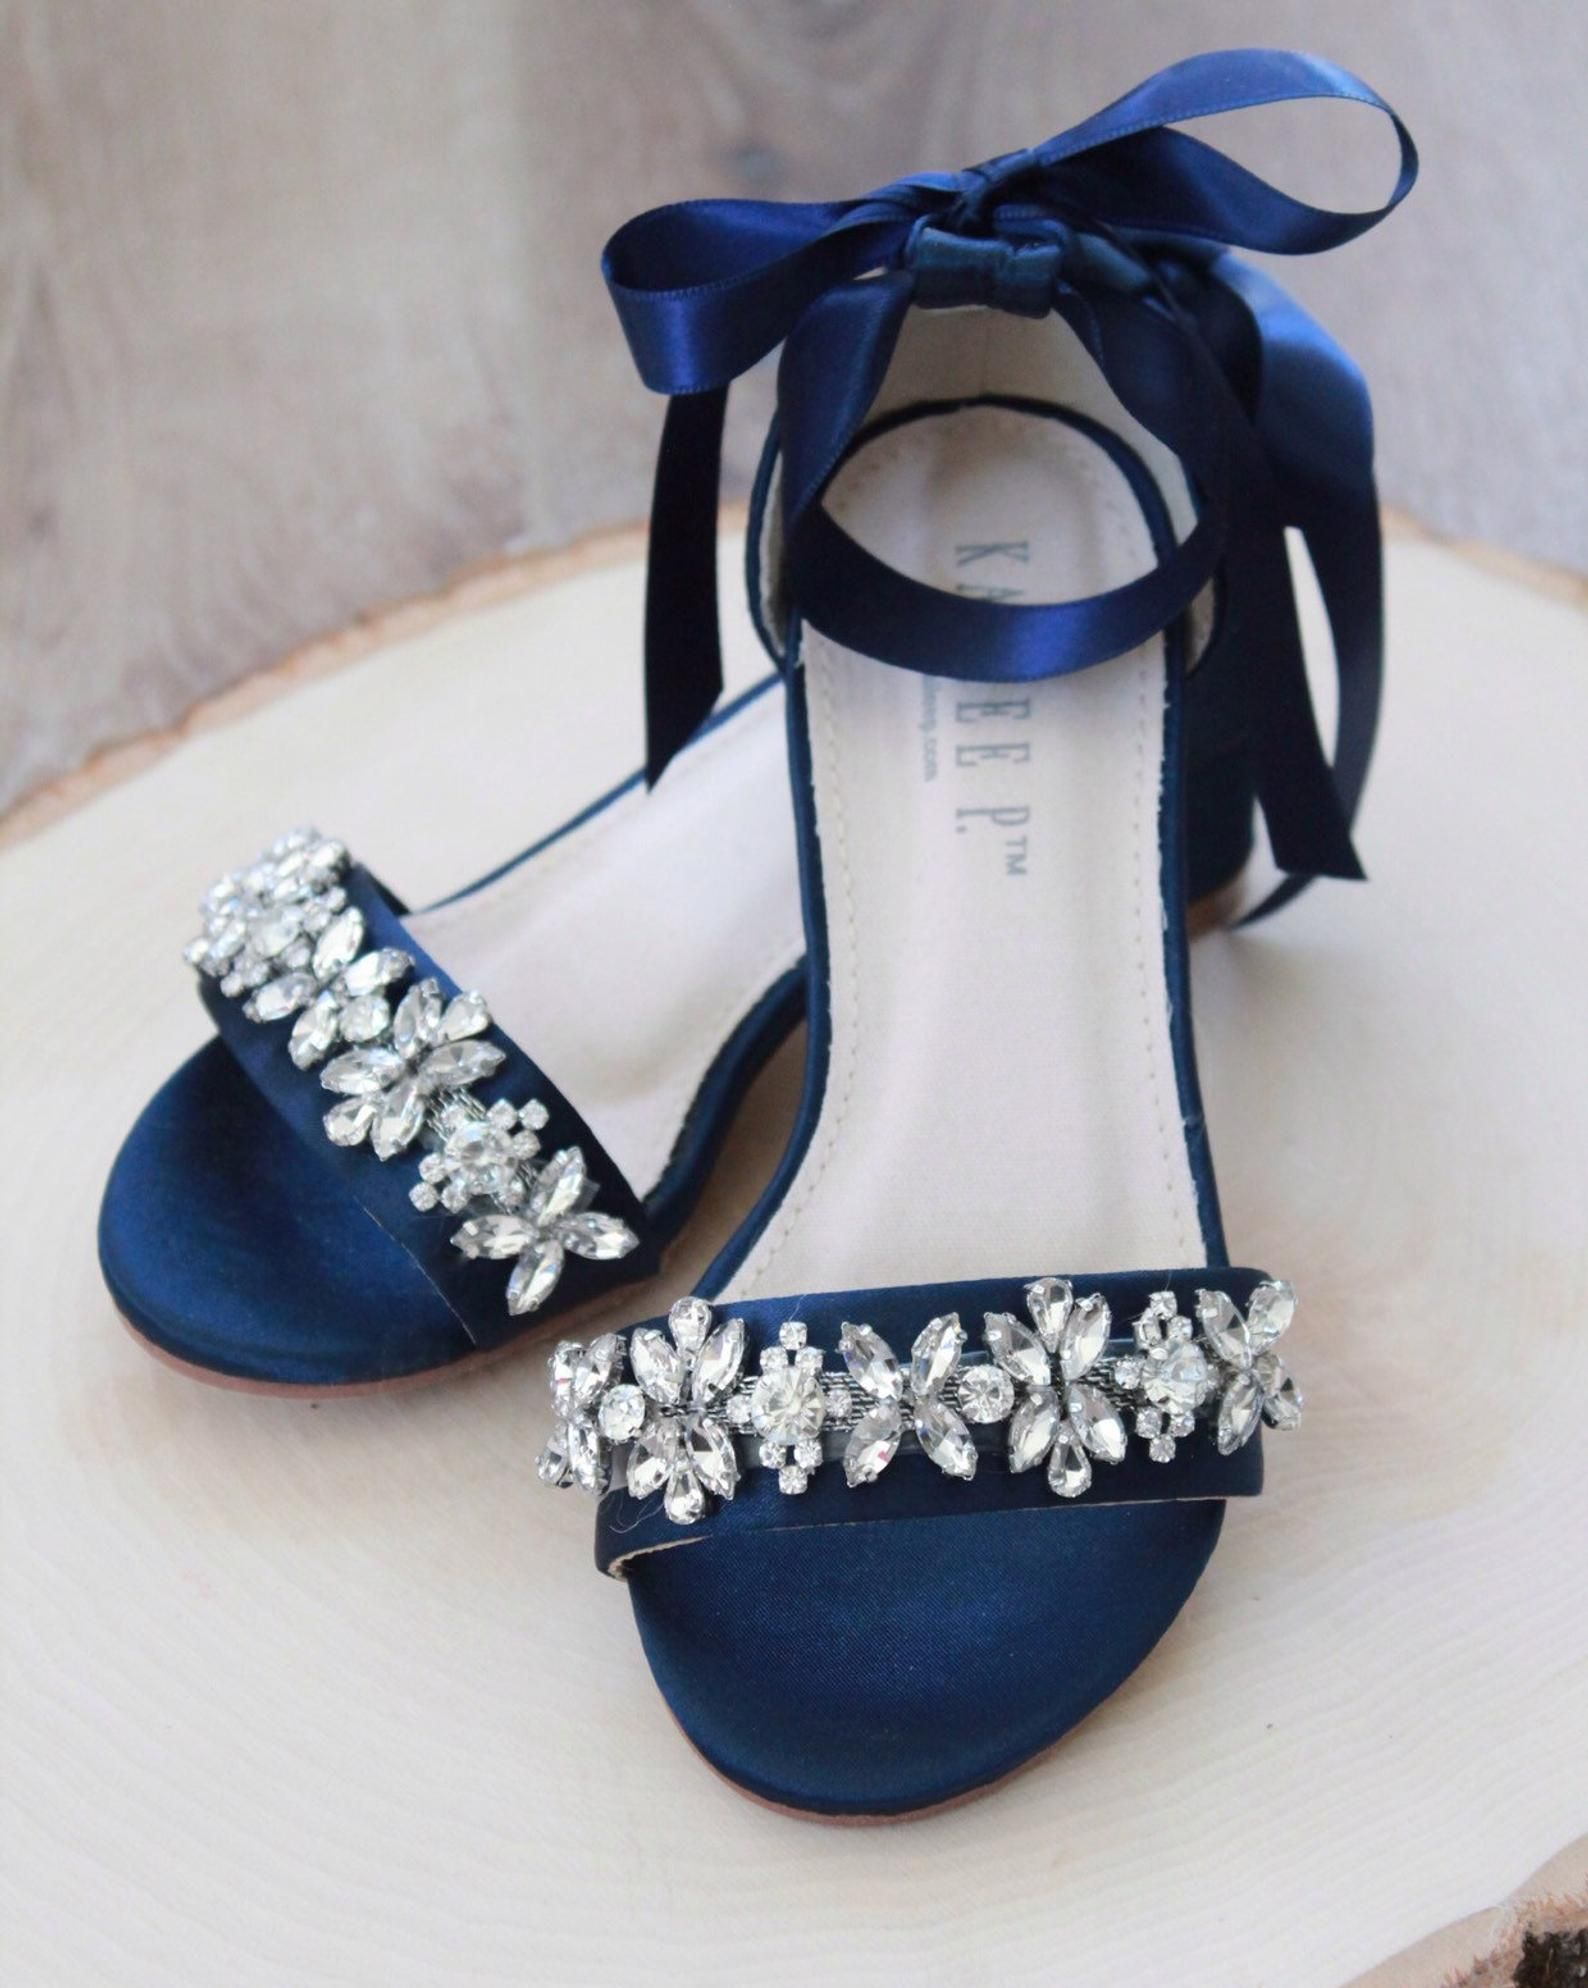 Navy Blue Satin Block Heel Sandals With Floral Rhinestones On Upper Strap In 2020 Bride Heels Wedding Shoes Heels Bridesmaid Shoes